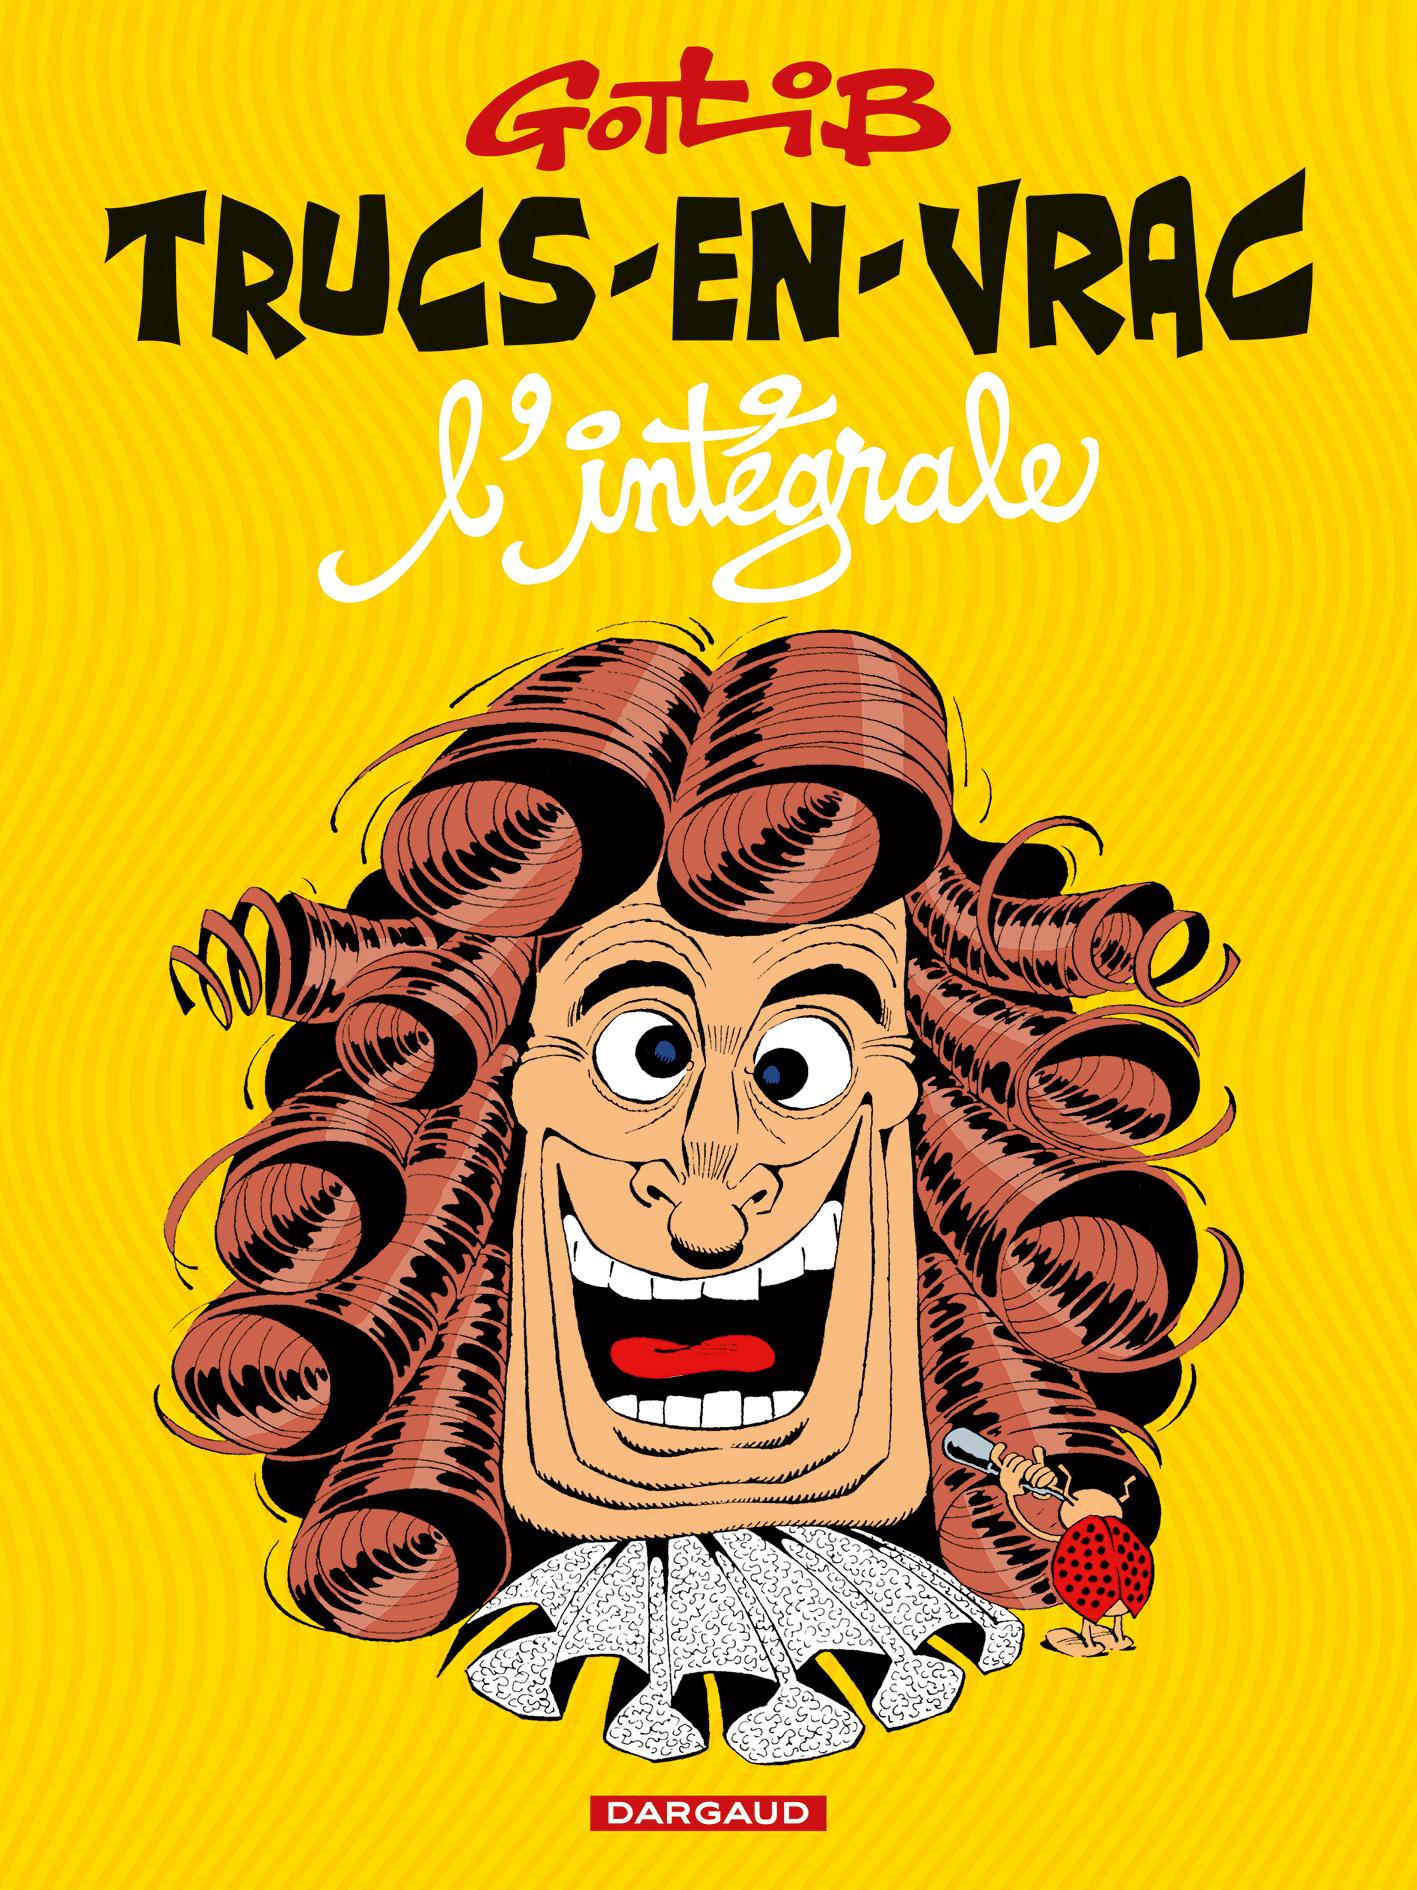 TRUC EN VRAC (INTEGRALE) - TRUCS-EN-VRAC - INTEGRALE - TOME 0 - INTEGRALE TRUCS-EN-VRAC